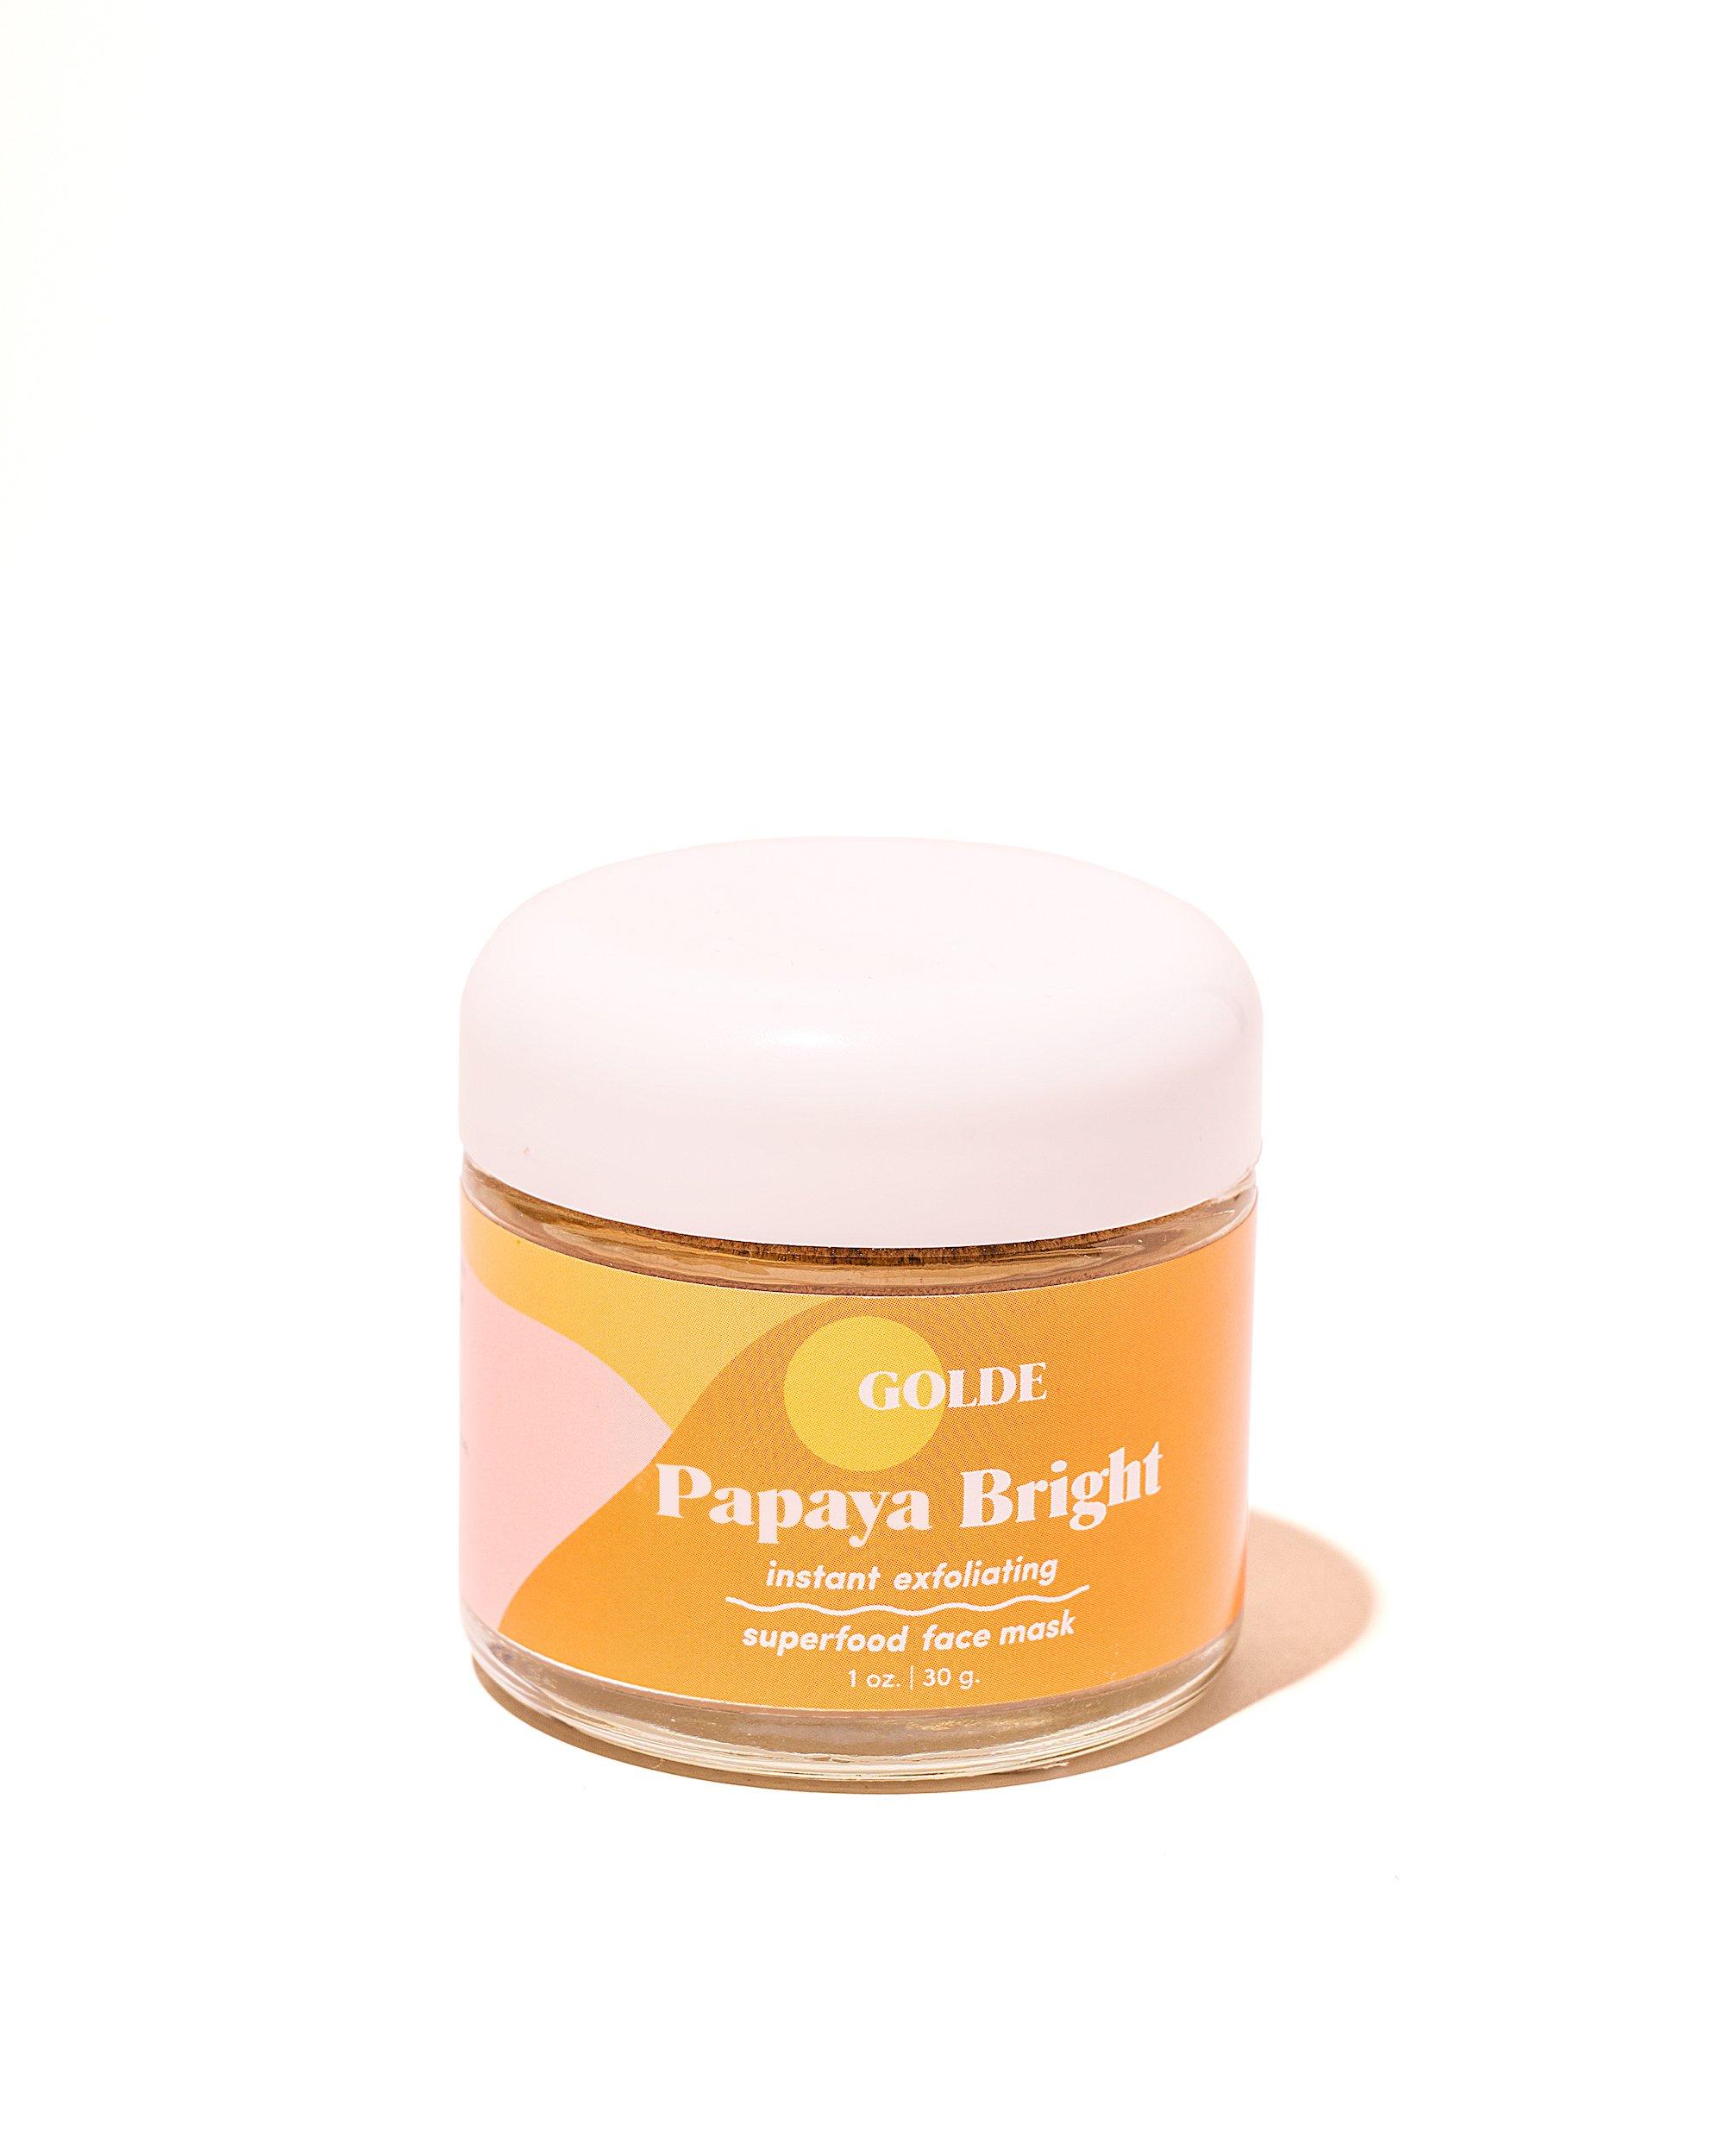 Golde Papaya Bright Face Mask gimme the good stuff